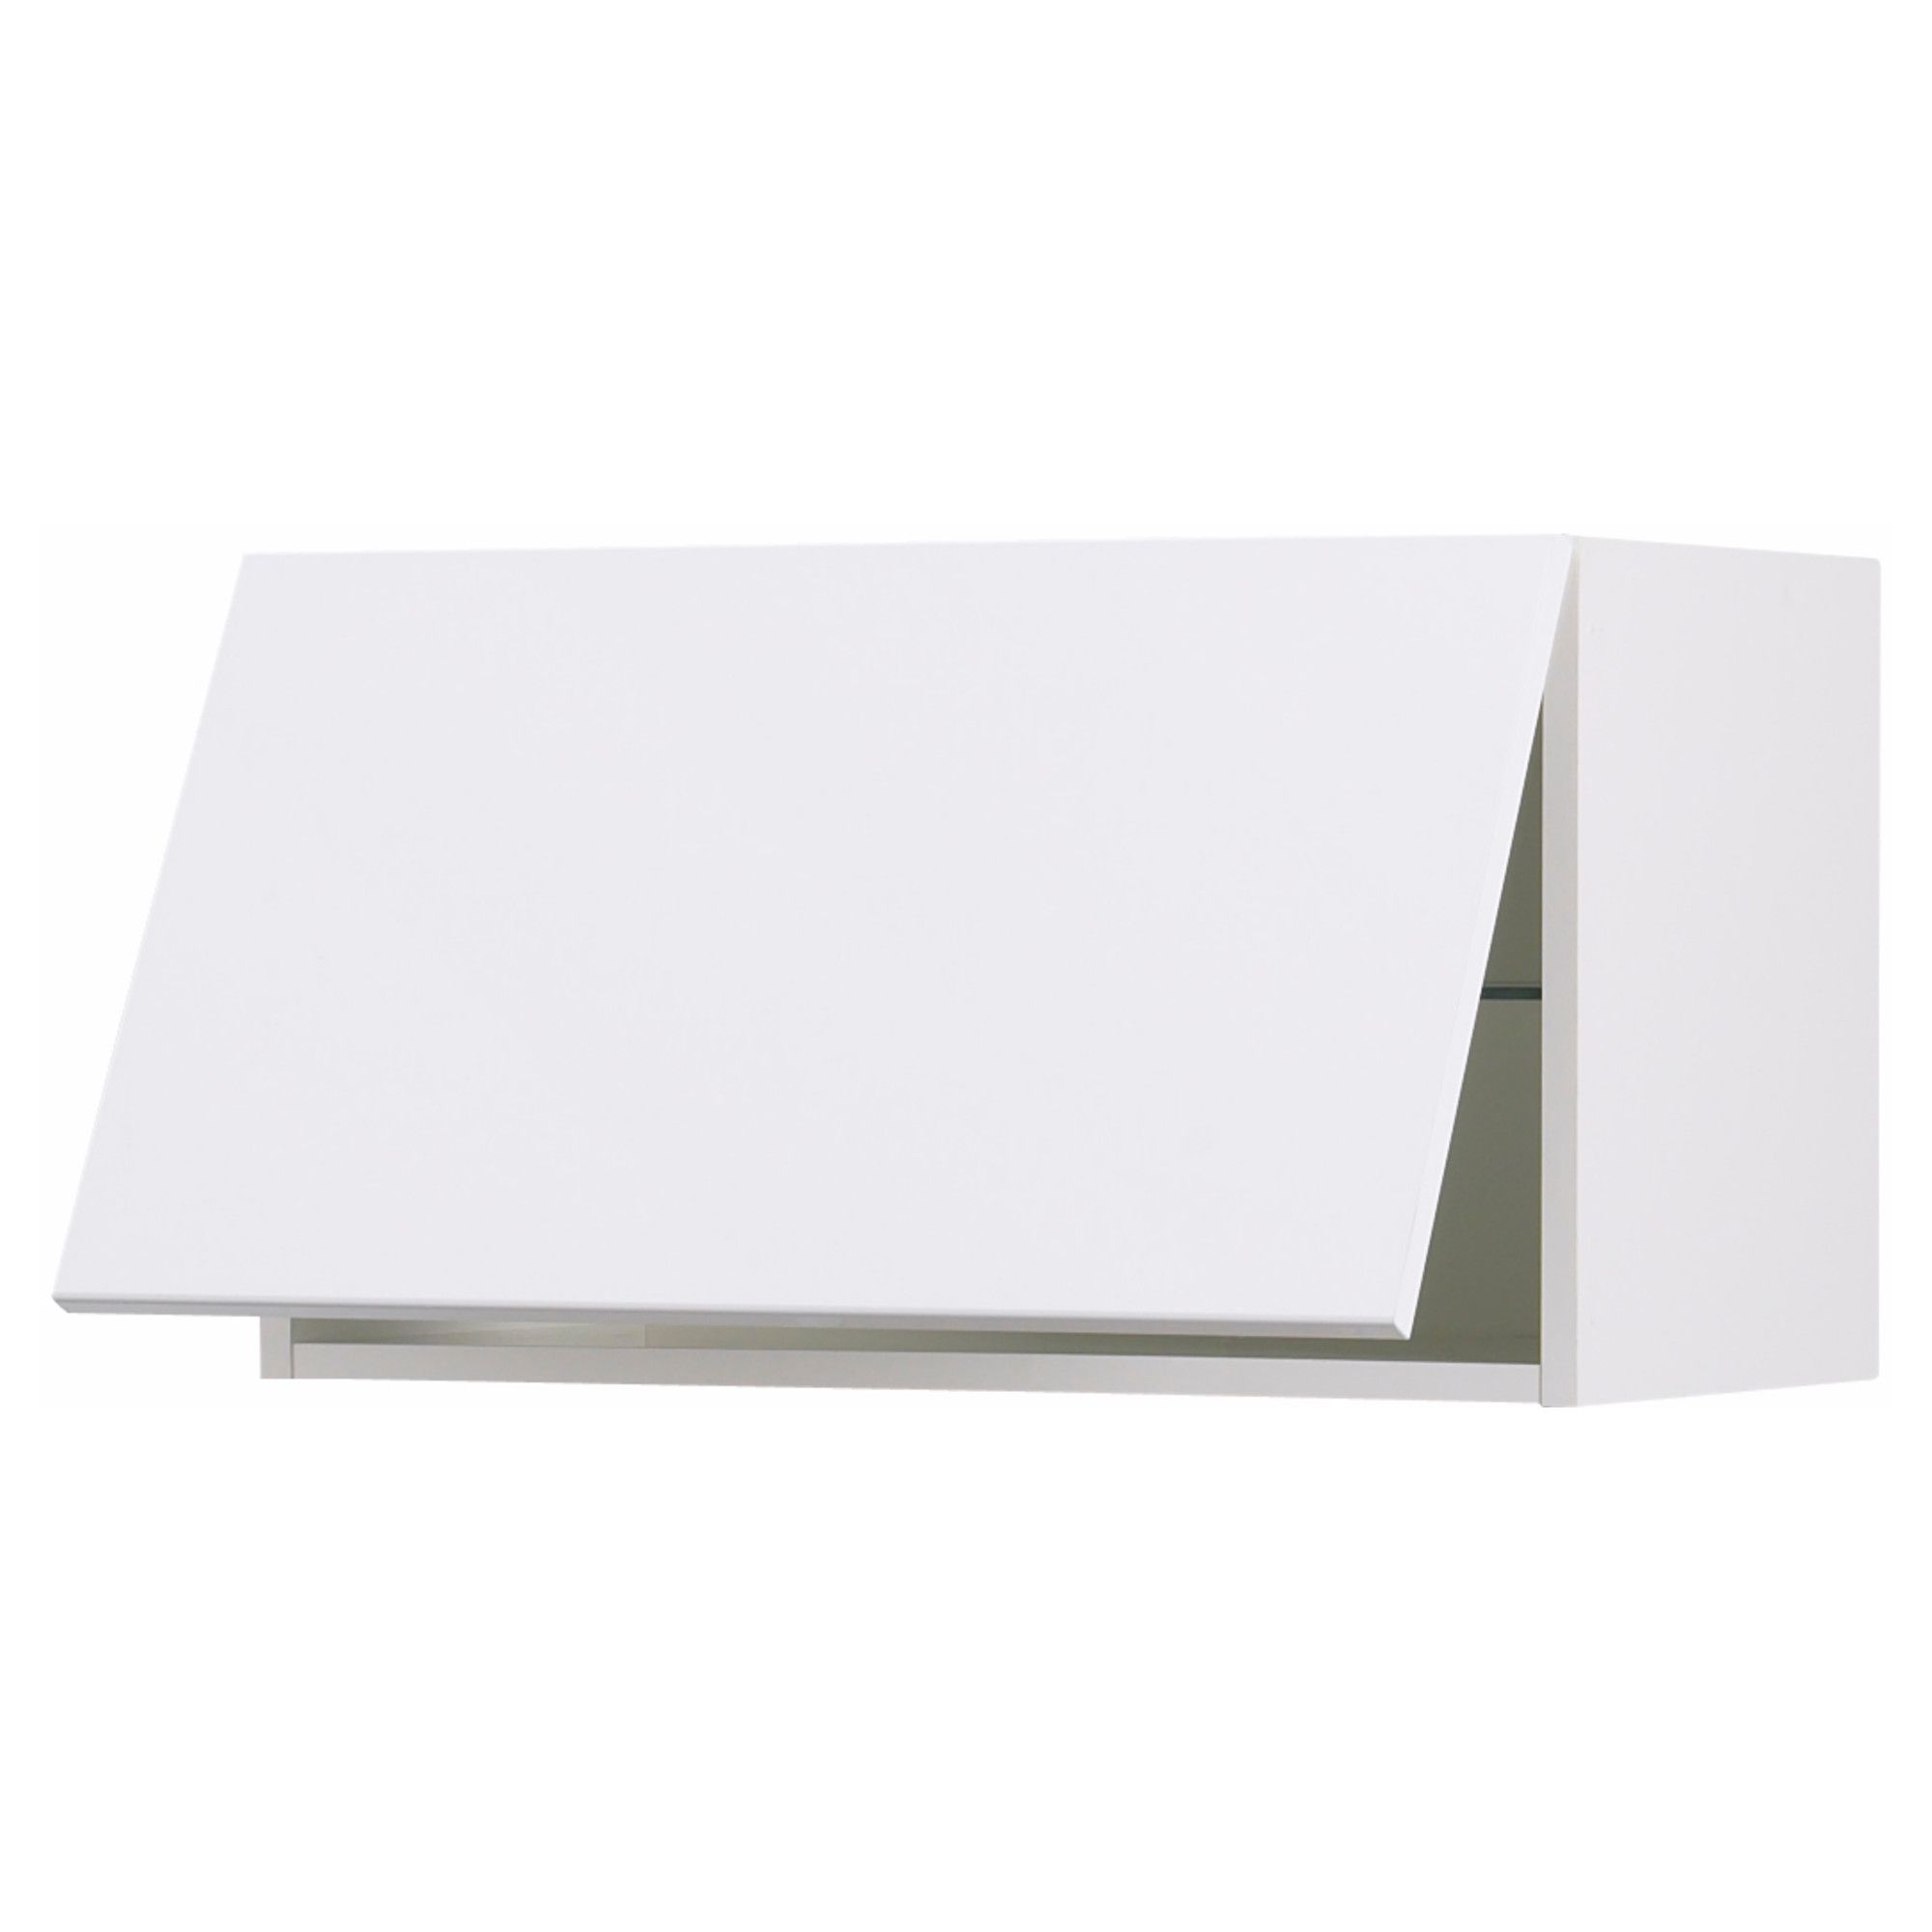 Exceptionnel AKURUM Wall Cabinet Horizontal   White, Abstrakt High Gloss White, 30x15    IKEA